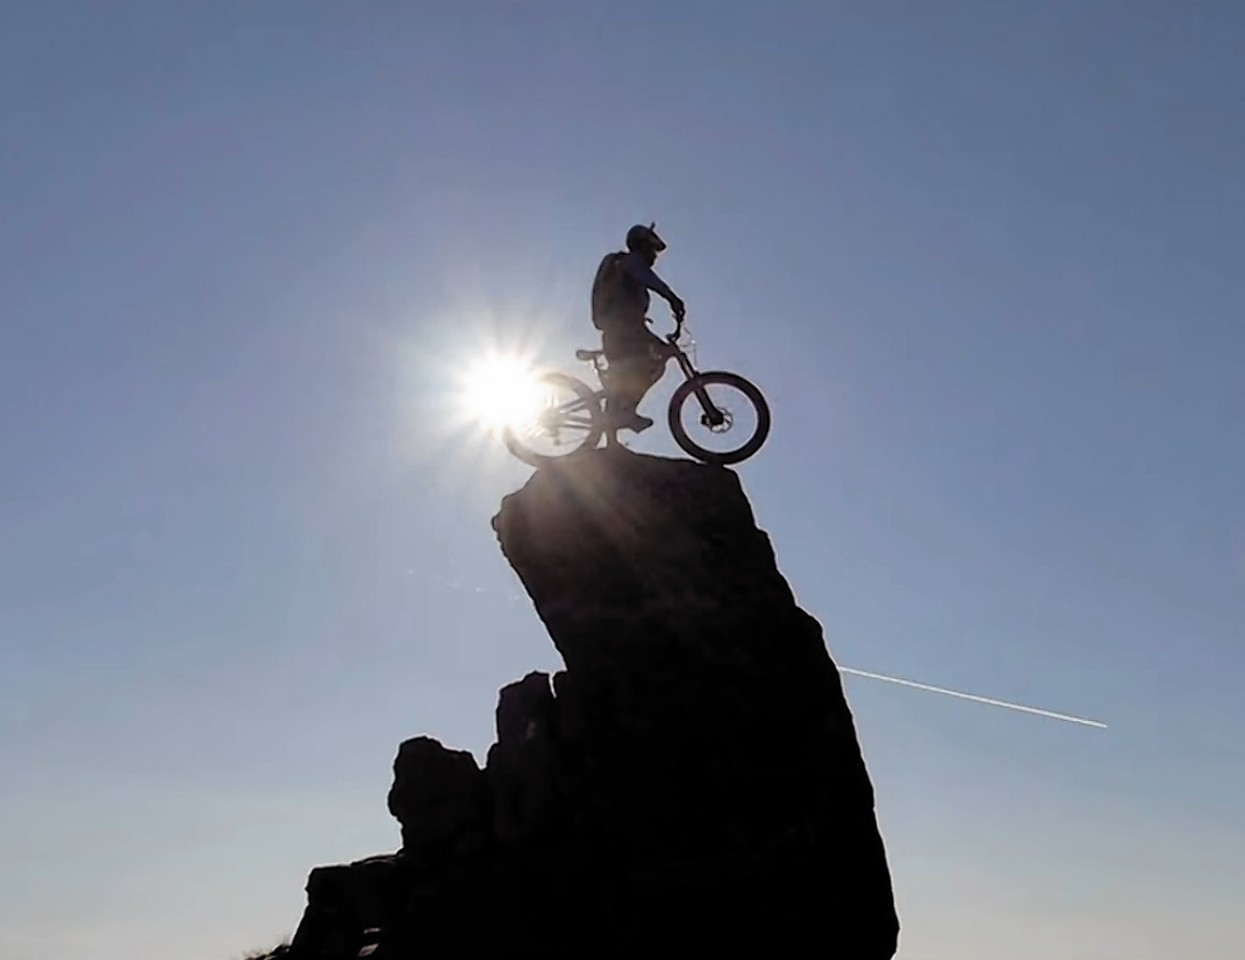 Danny MacAskill last year released the stunning video, The Ridge